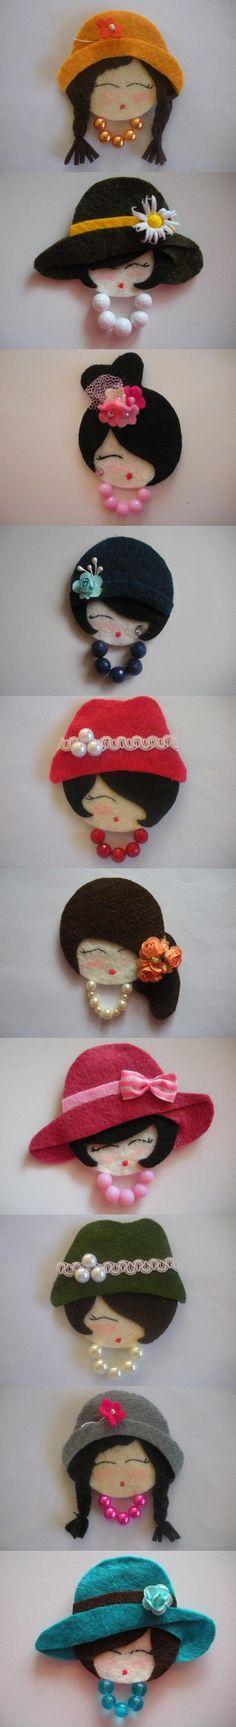 10 broches de fieltro con caras de mujer.  Autor: Brochesdefieltro.net  ¡Me encantan!